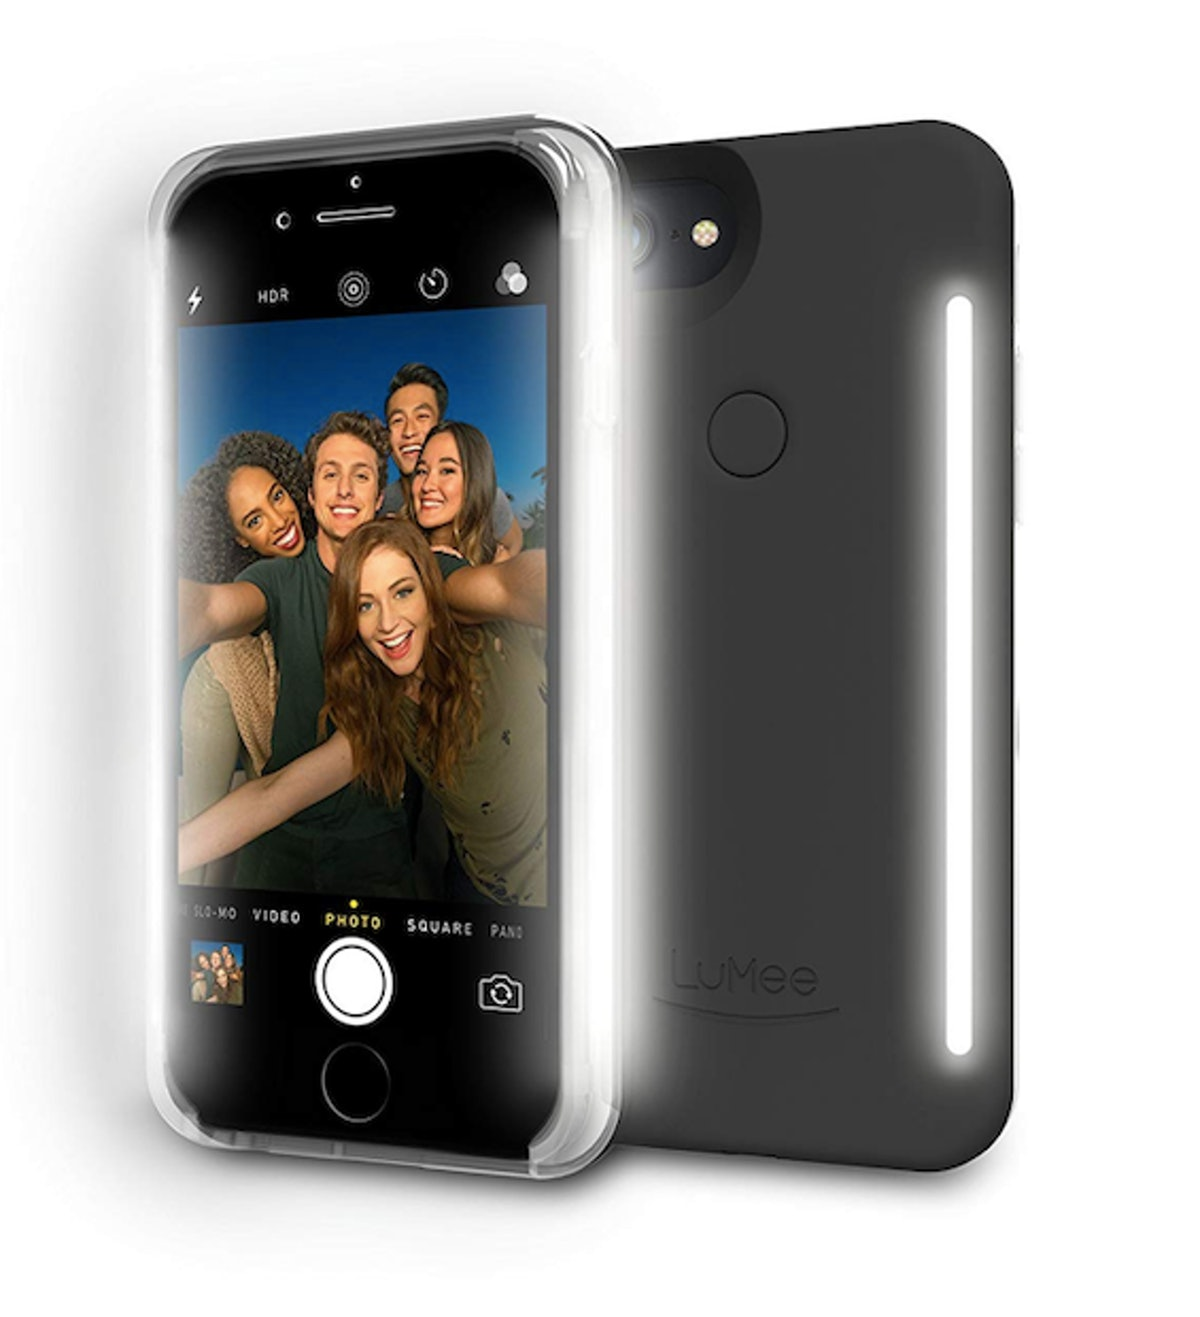 LuMee Duo Lighted iPhone Case